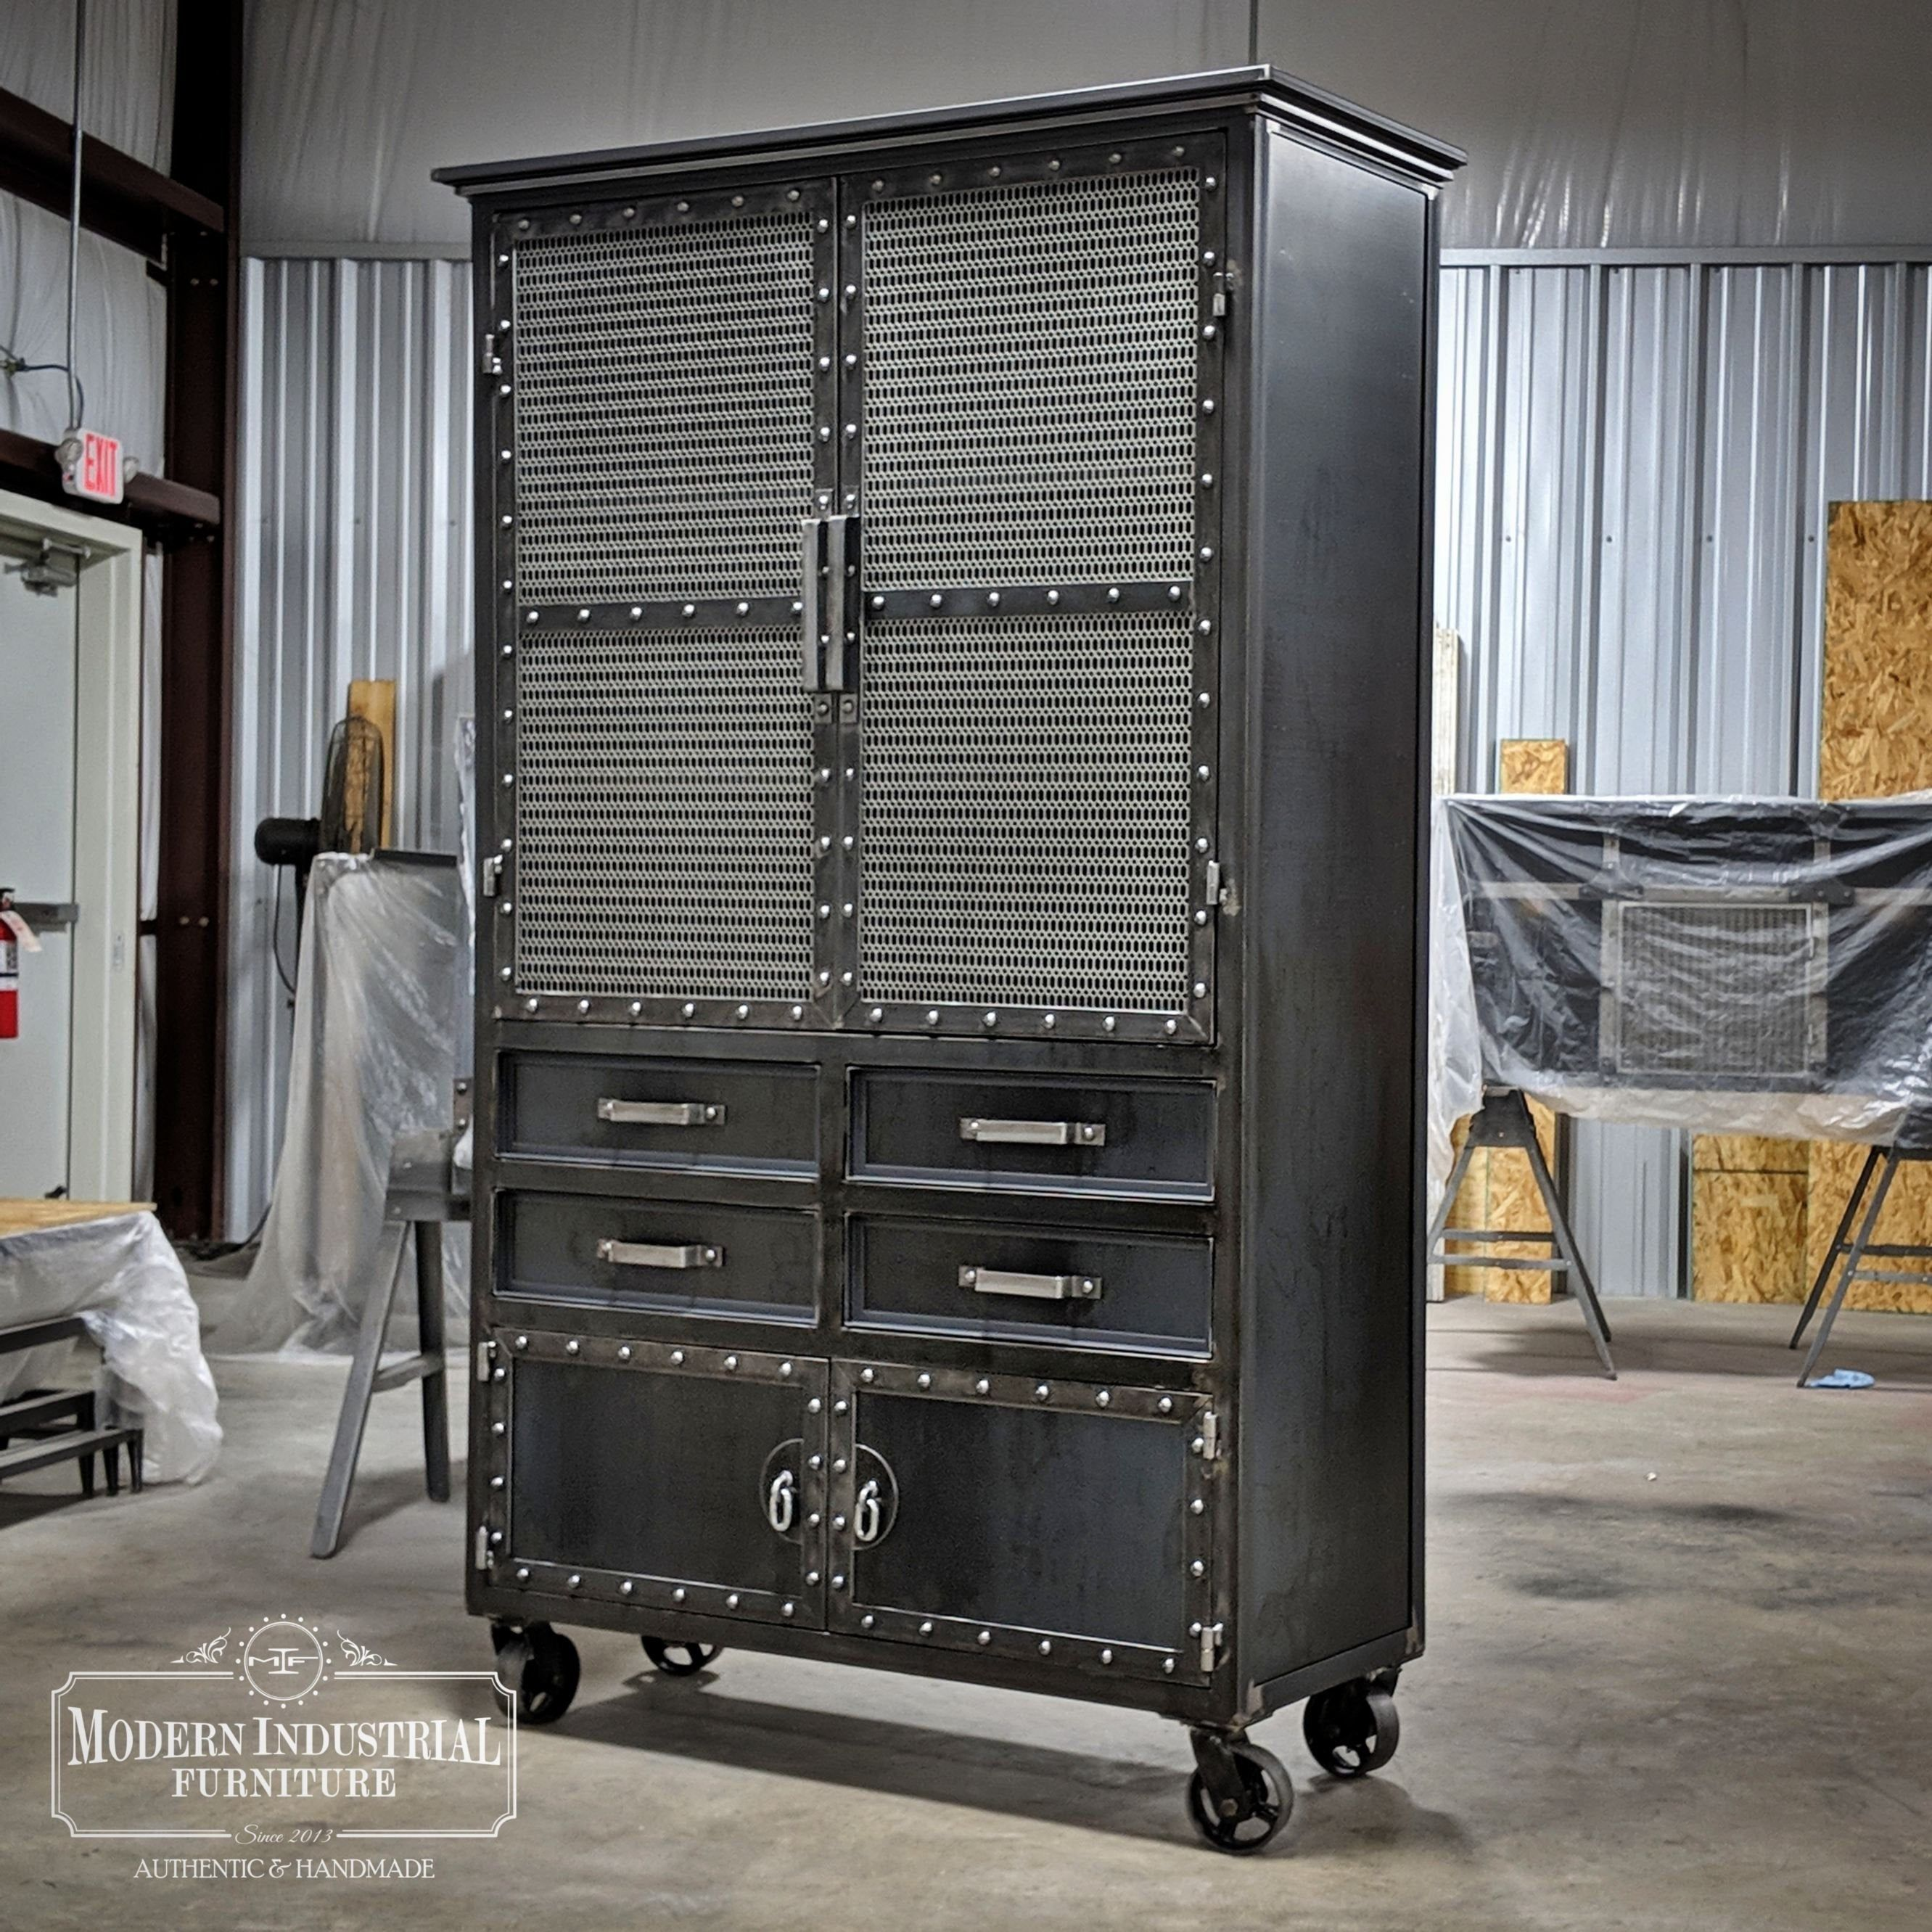 Modern Industrial Armoire Steel Locker Closet Vintage Industrial Cabinet Wardrobe Locker Storage Drankkast Meubels Interieur